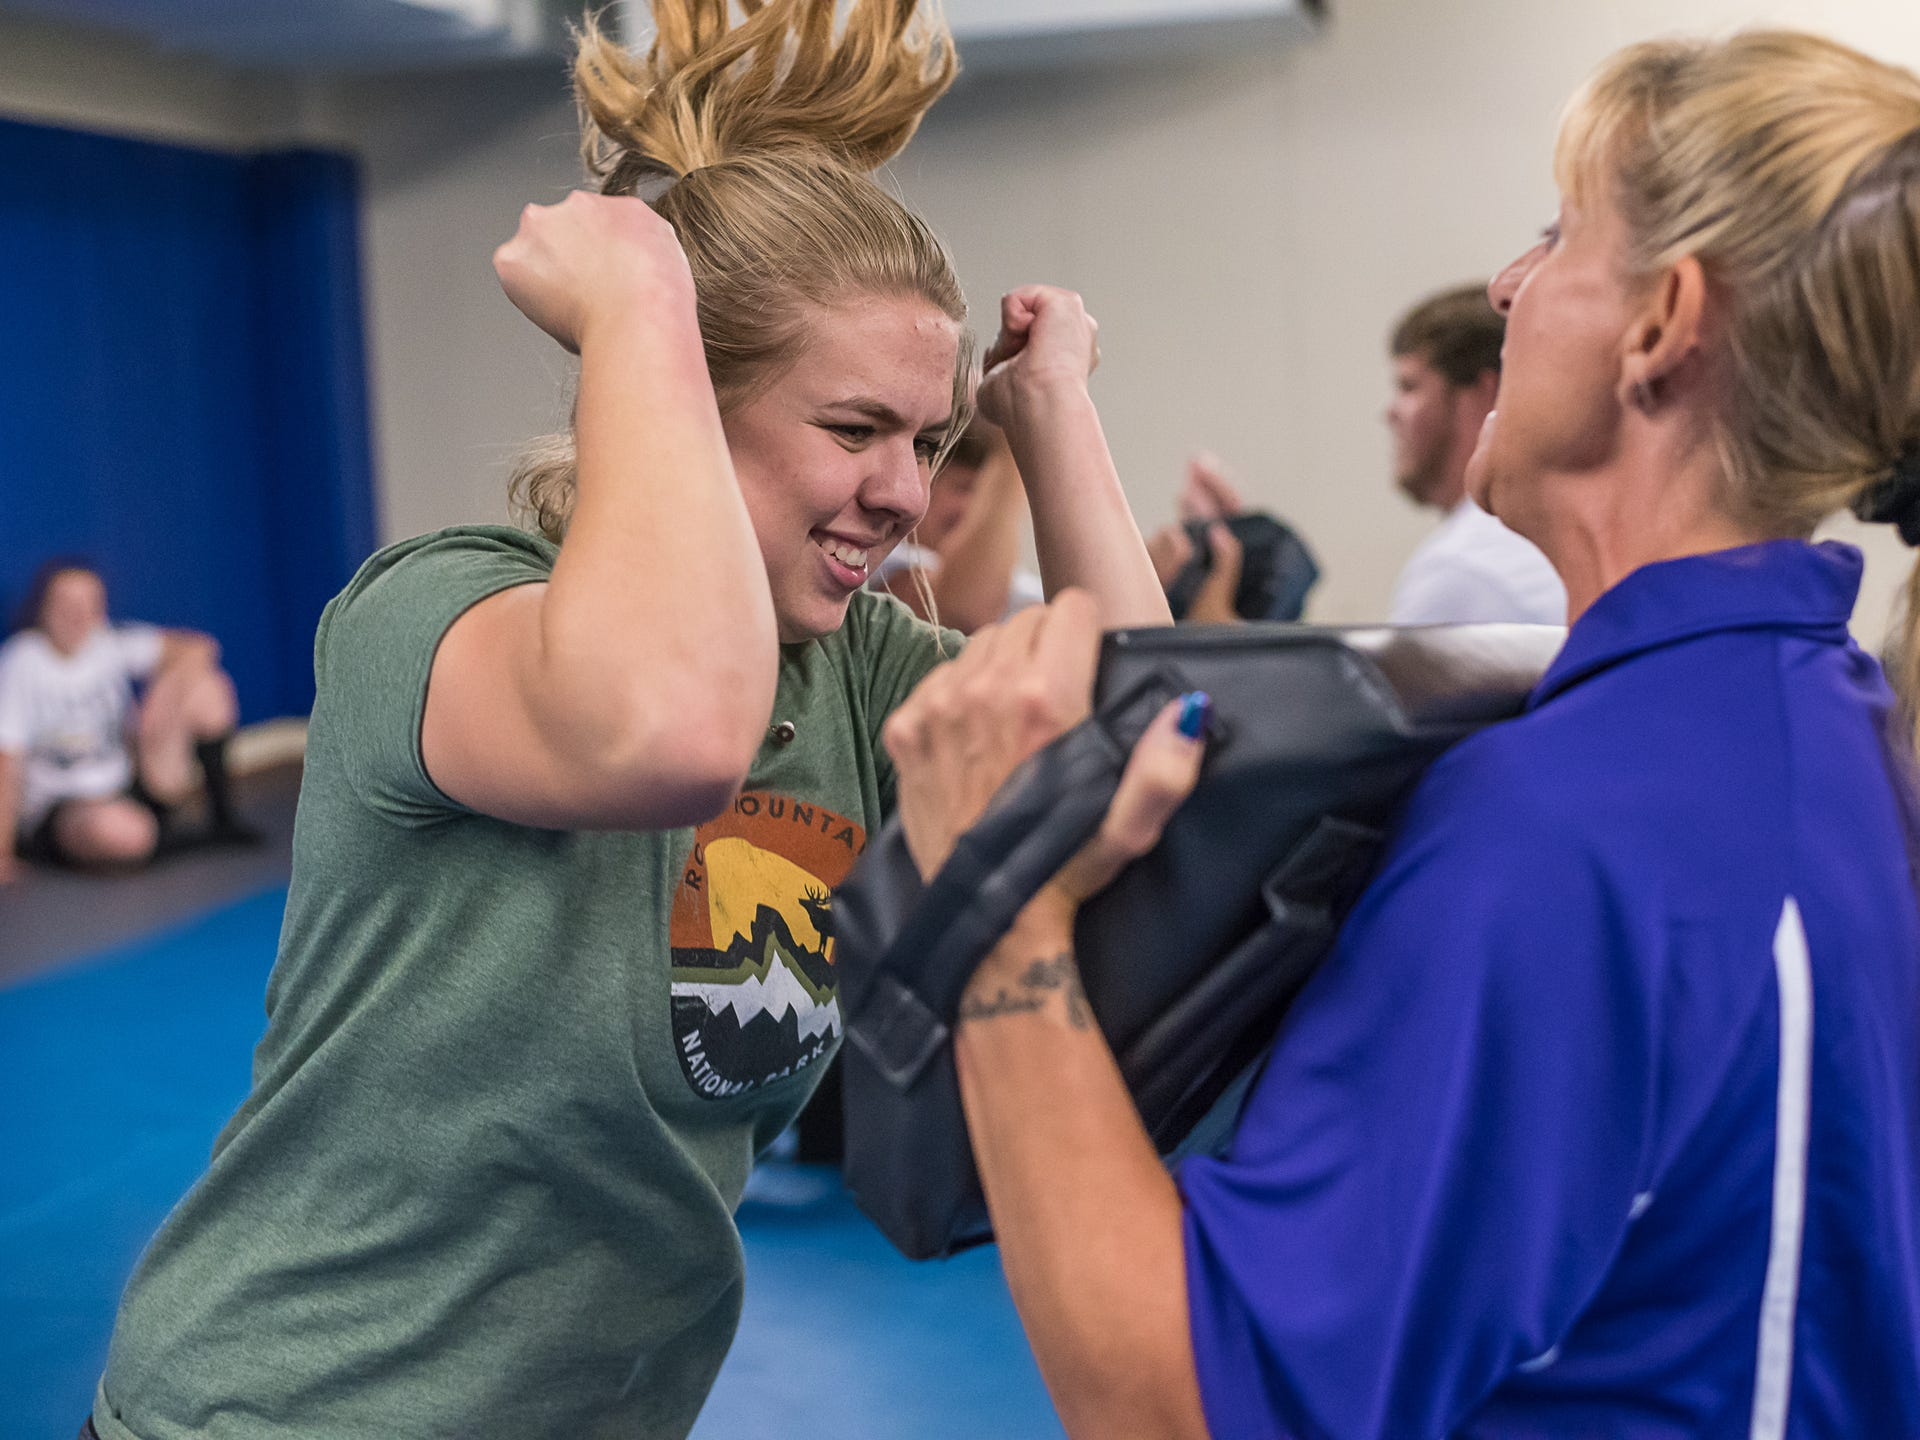 Photos: Female self defense class held by Loveland Police